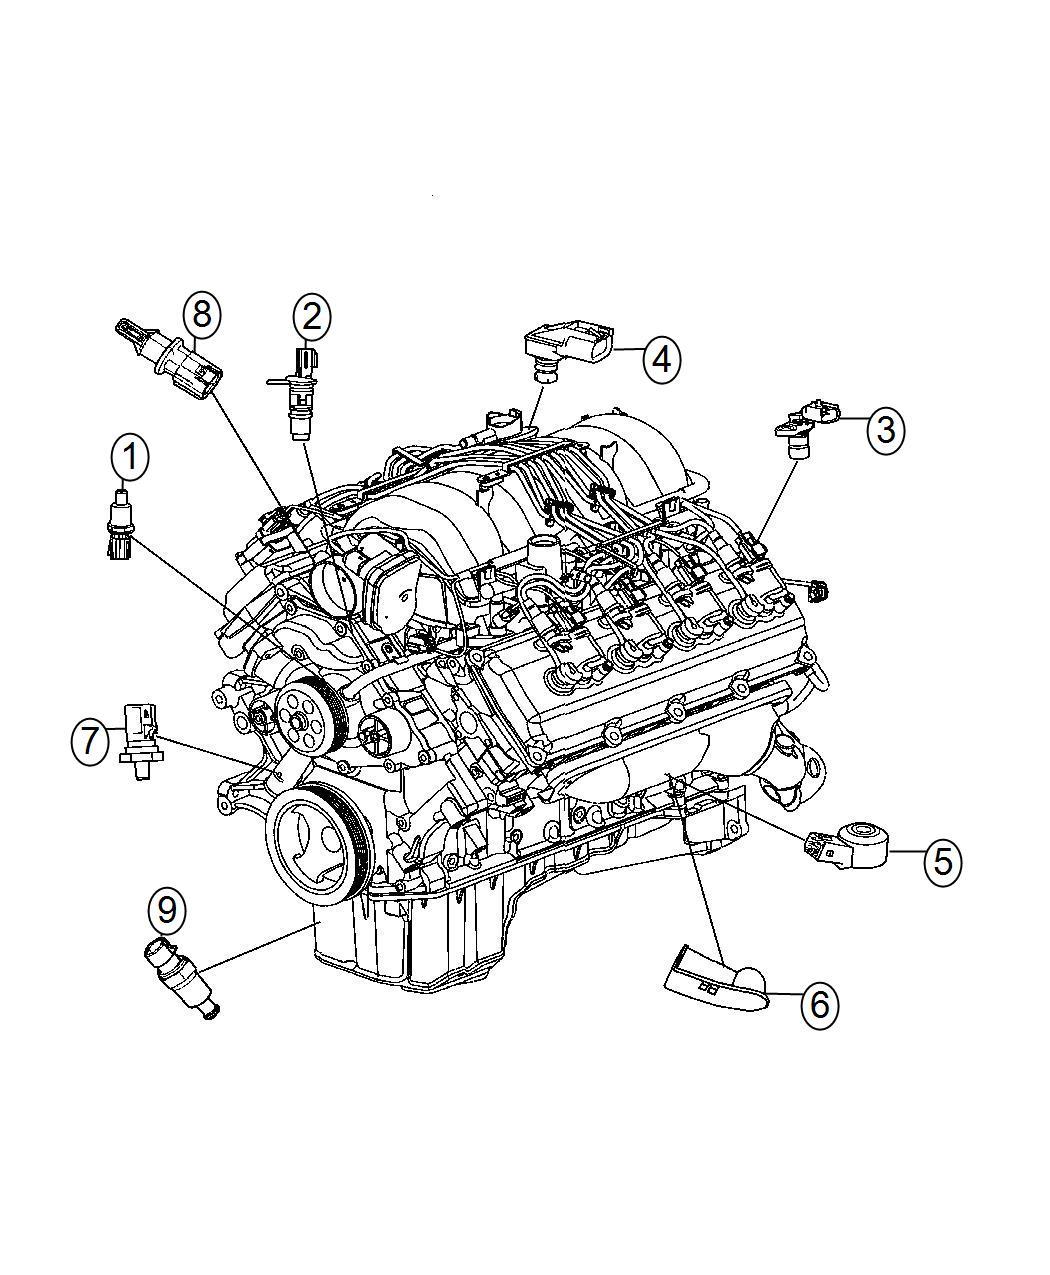 2007 Chrysler 300 Hemi 57 Engine Diagram